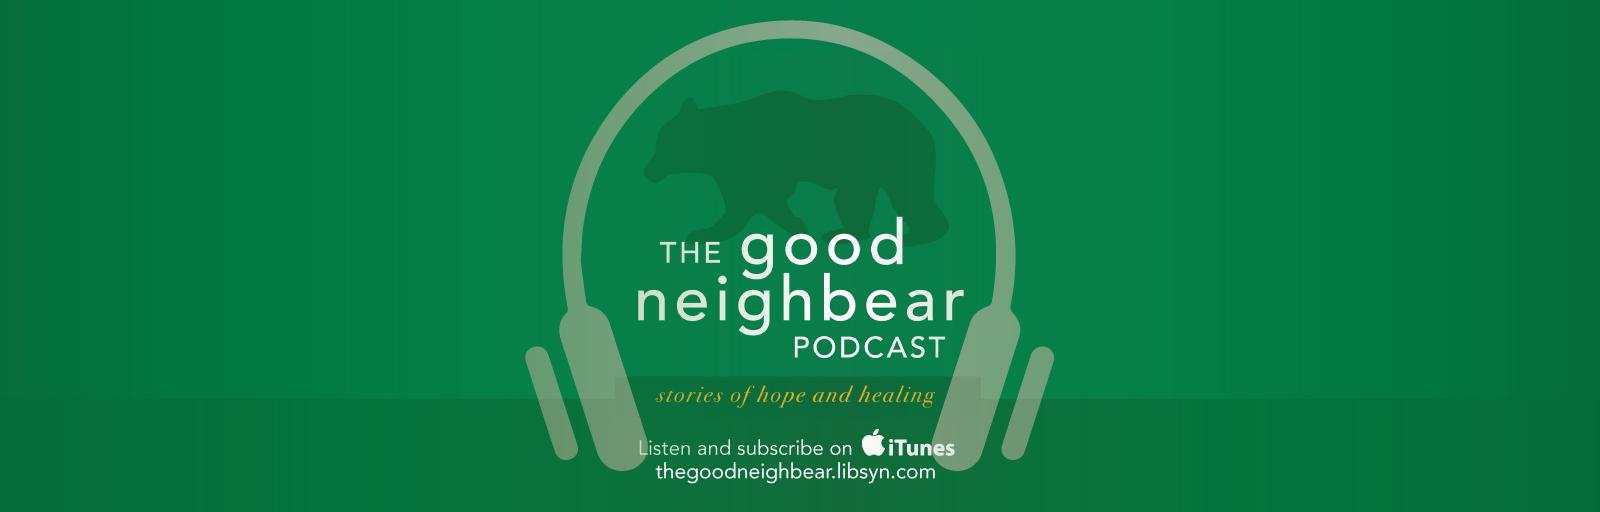 Good-Neighbear-Podcast-Diversity